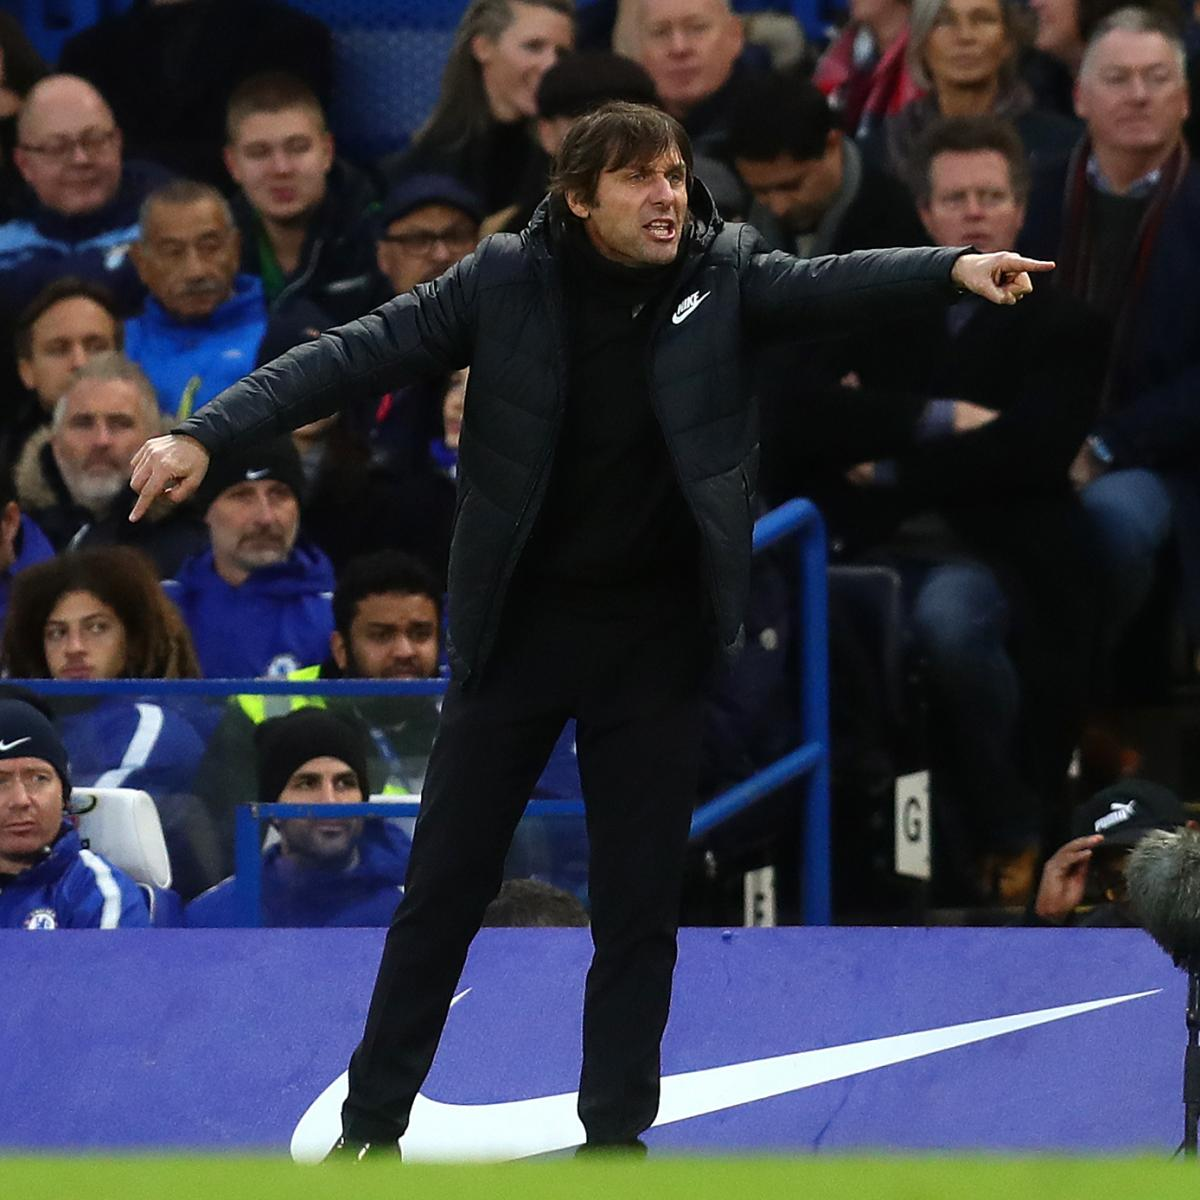 Tottenham Vs Huddersfield Live: Premier League Fixtures: Live Stream, TV Schedule And Week